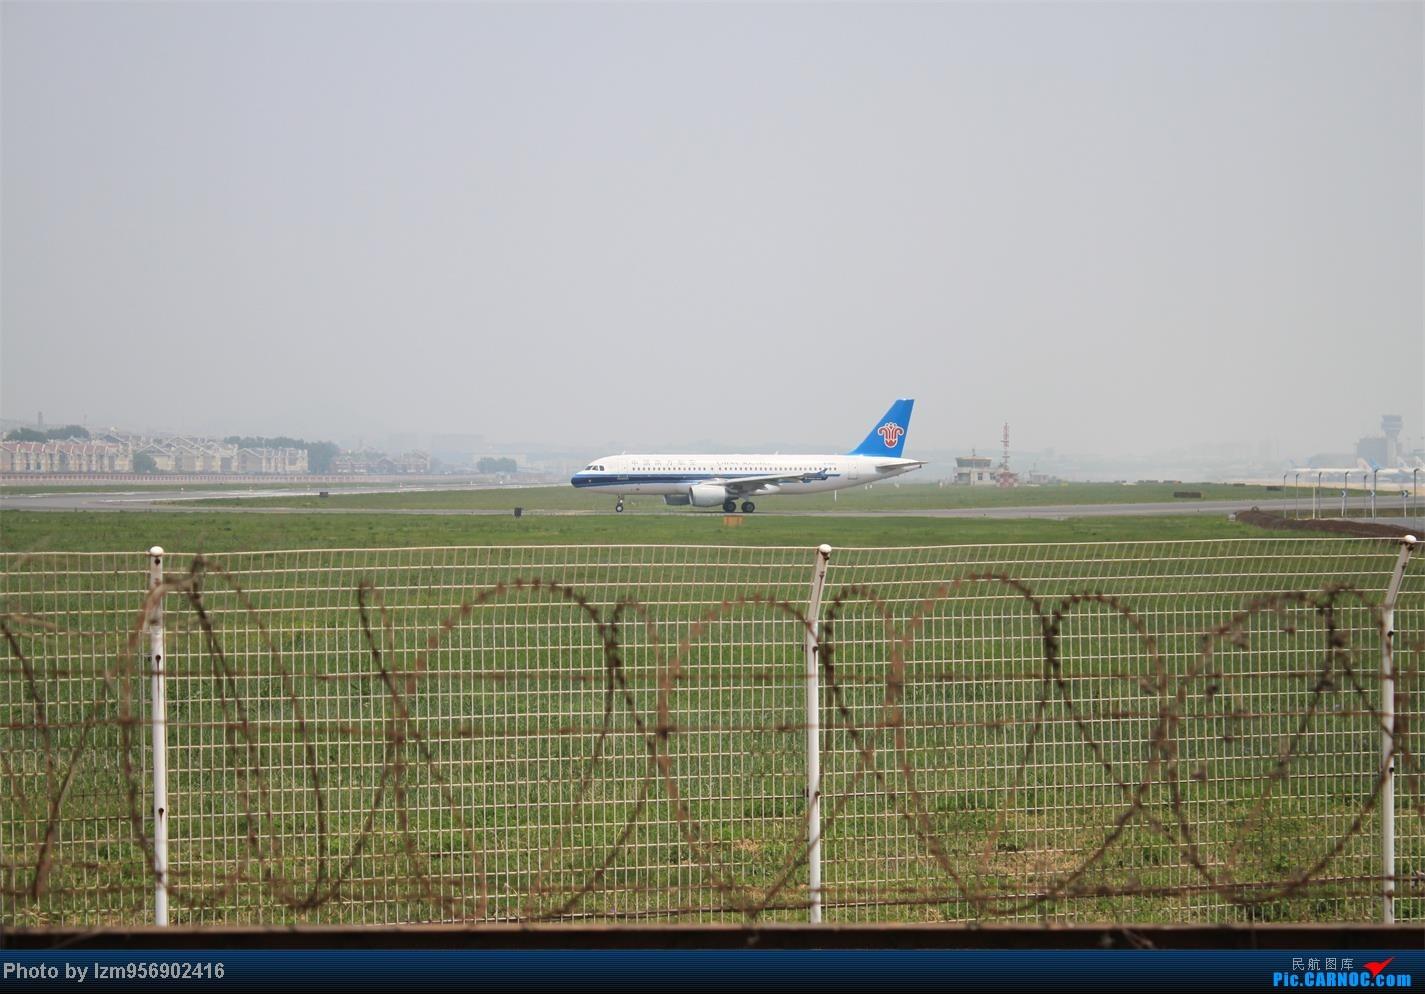 Re:[原创]DLC蹲点大半天,拍到了大棒航空772=w= AIRBUS A320-200 B-1800 中国大连周水子机场